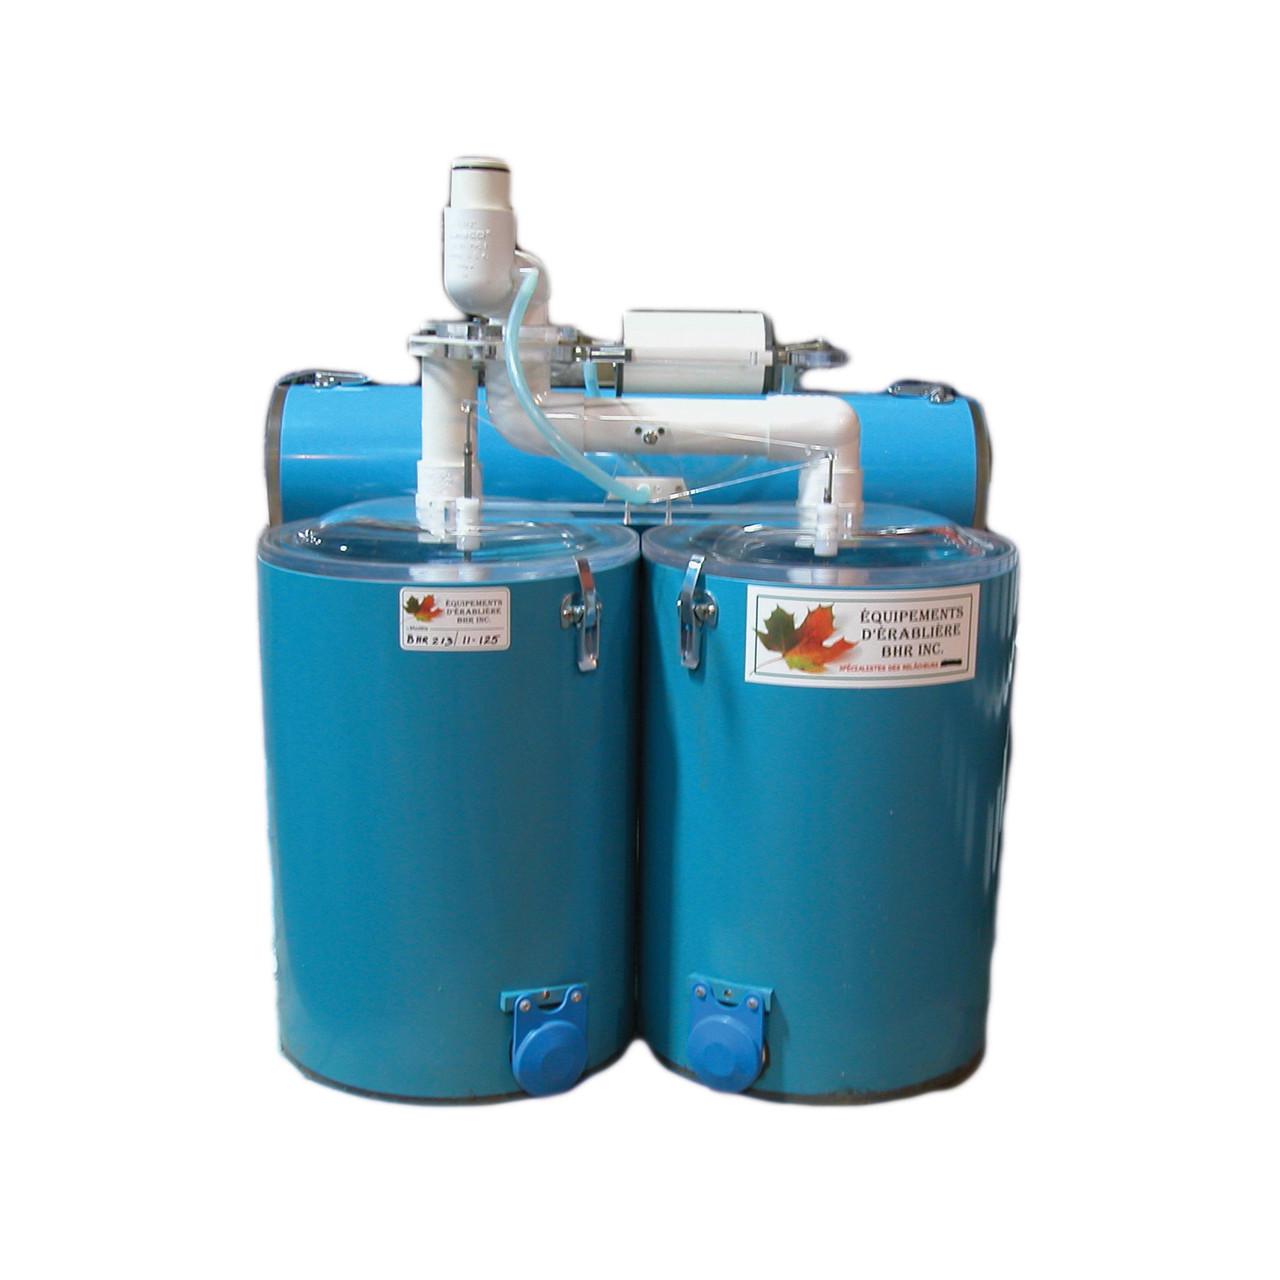 Mechanical Sap Releasers (Extractors)